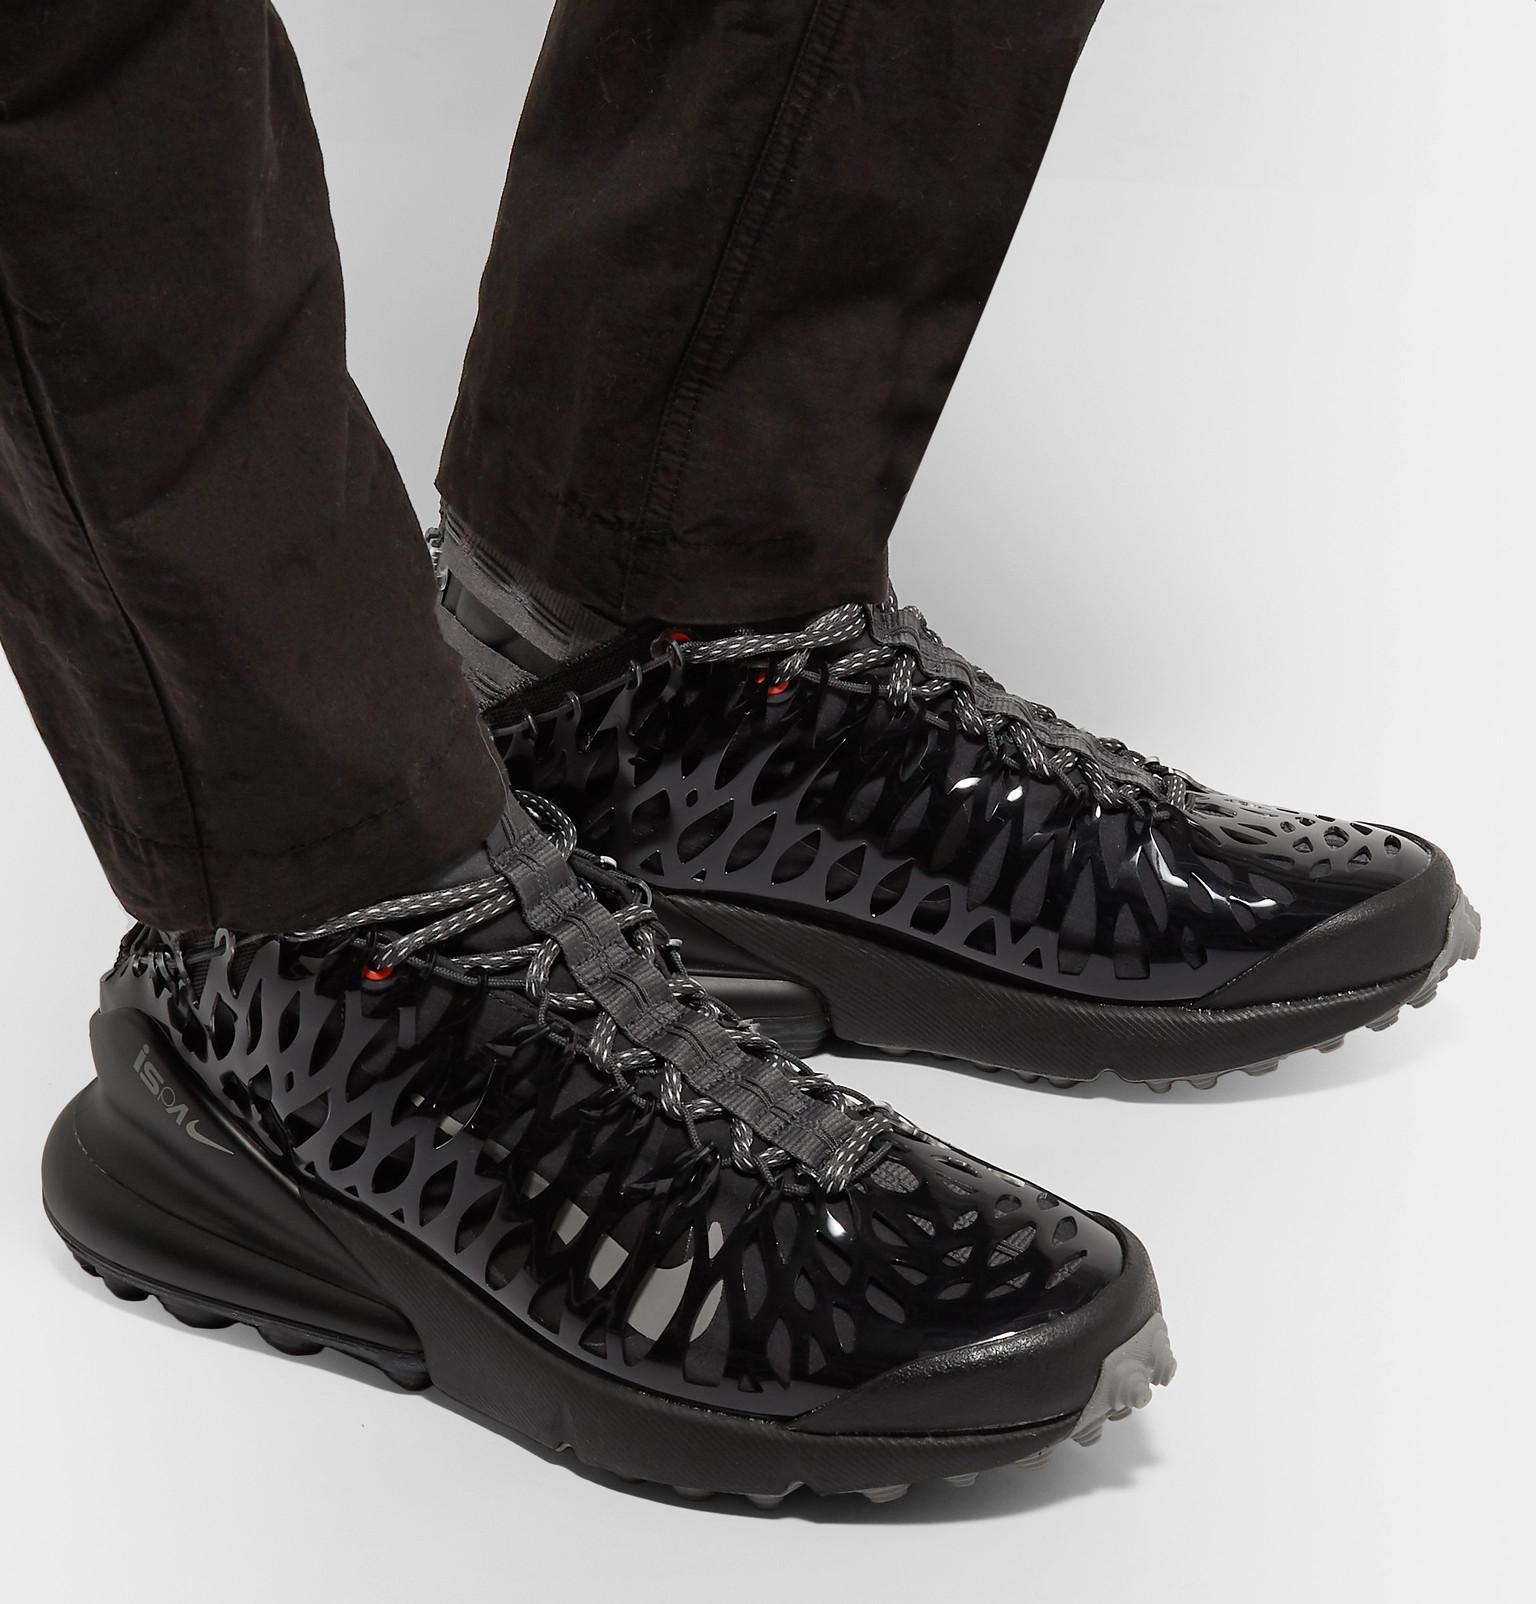 fed1066e4a Nike - ISPA Air Max 270 SP SOE Sneakers